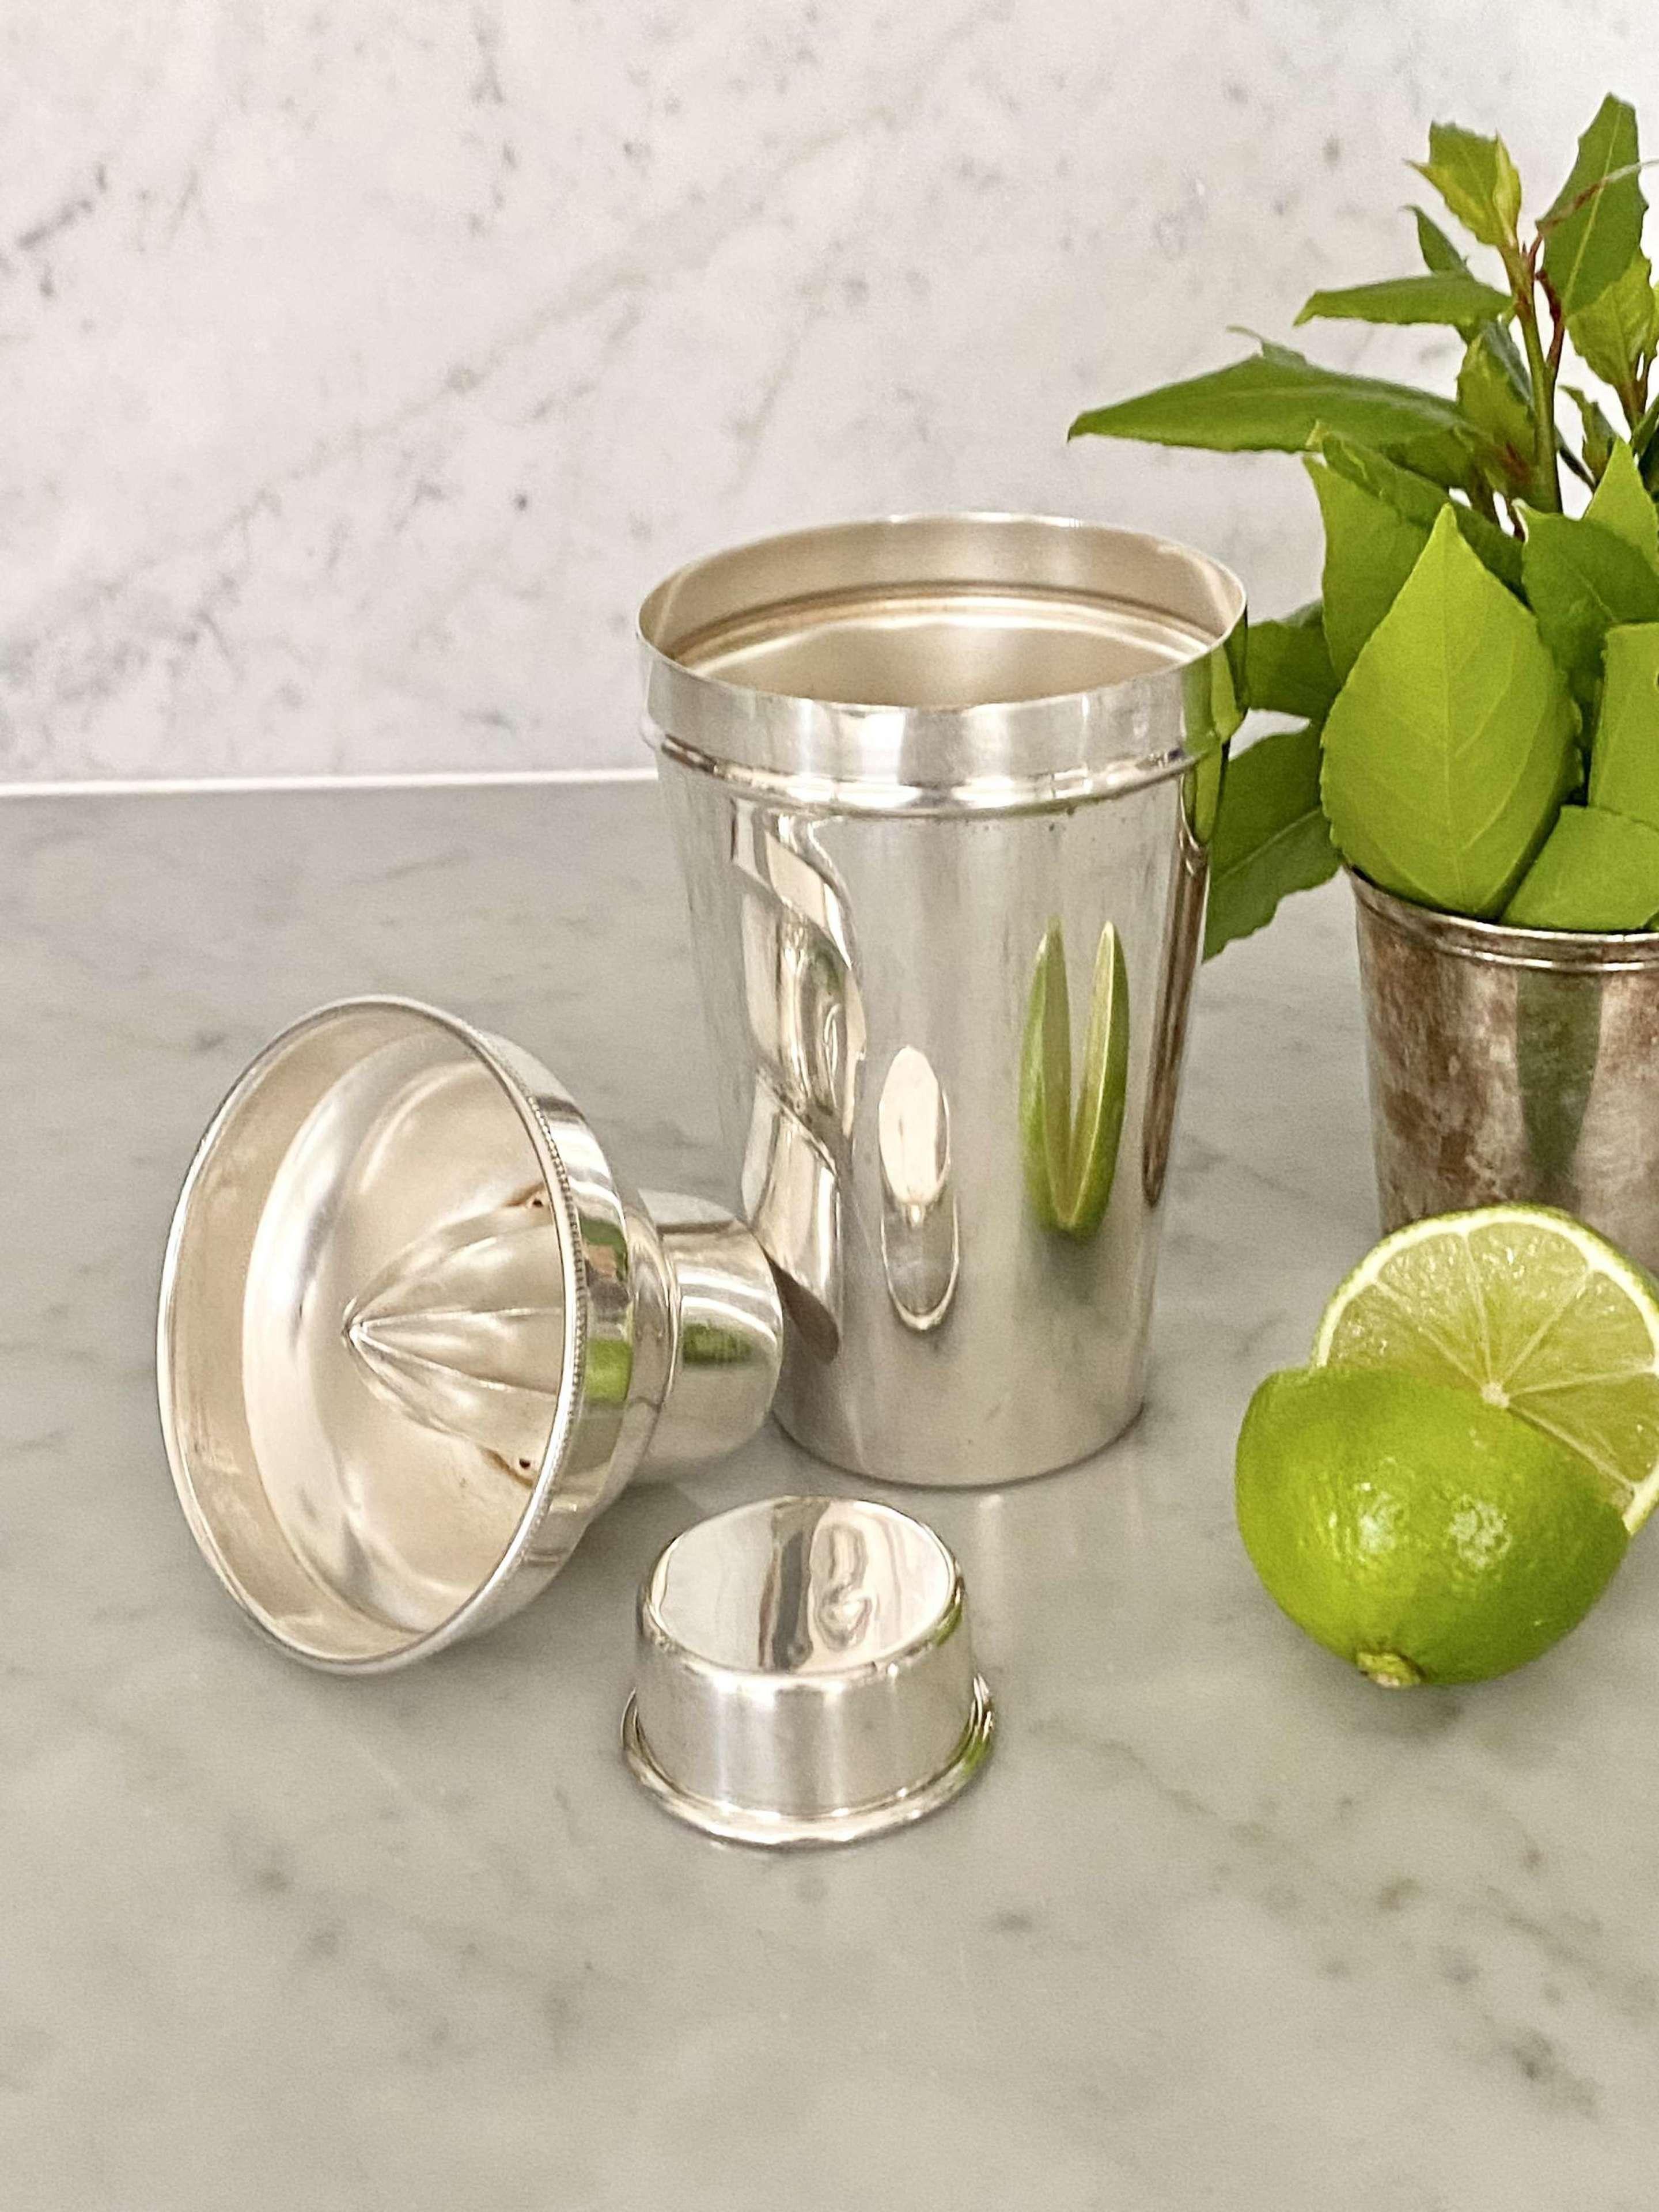 Lemon squeezer Art Deco silver plated cocktail shaker